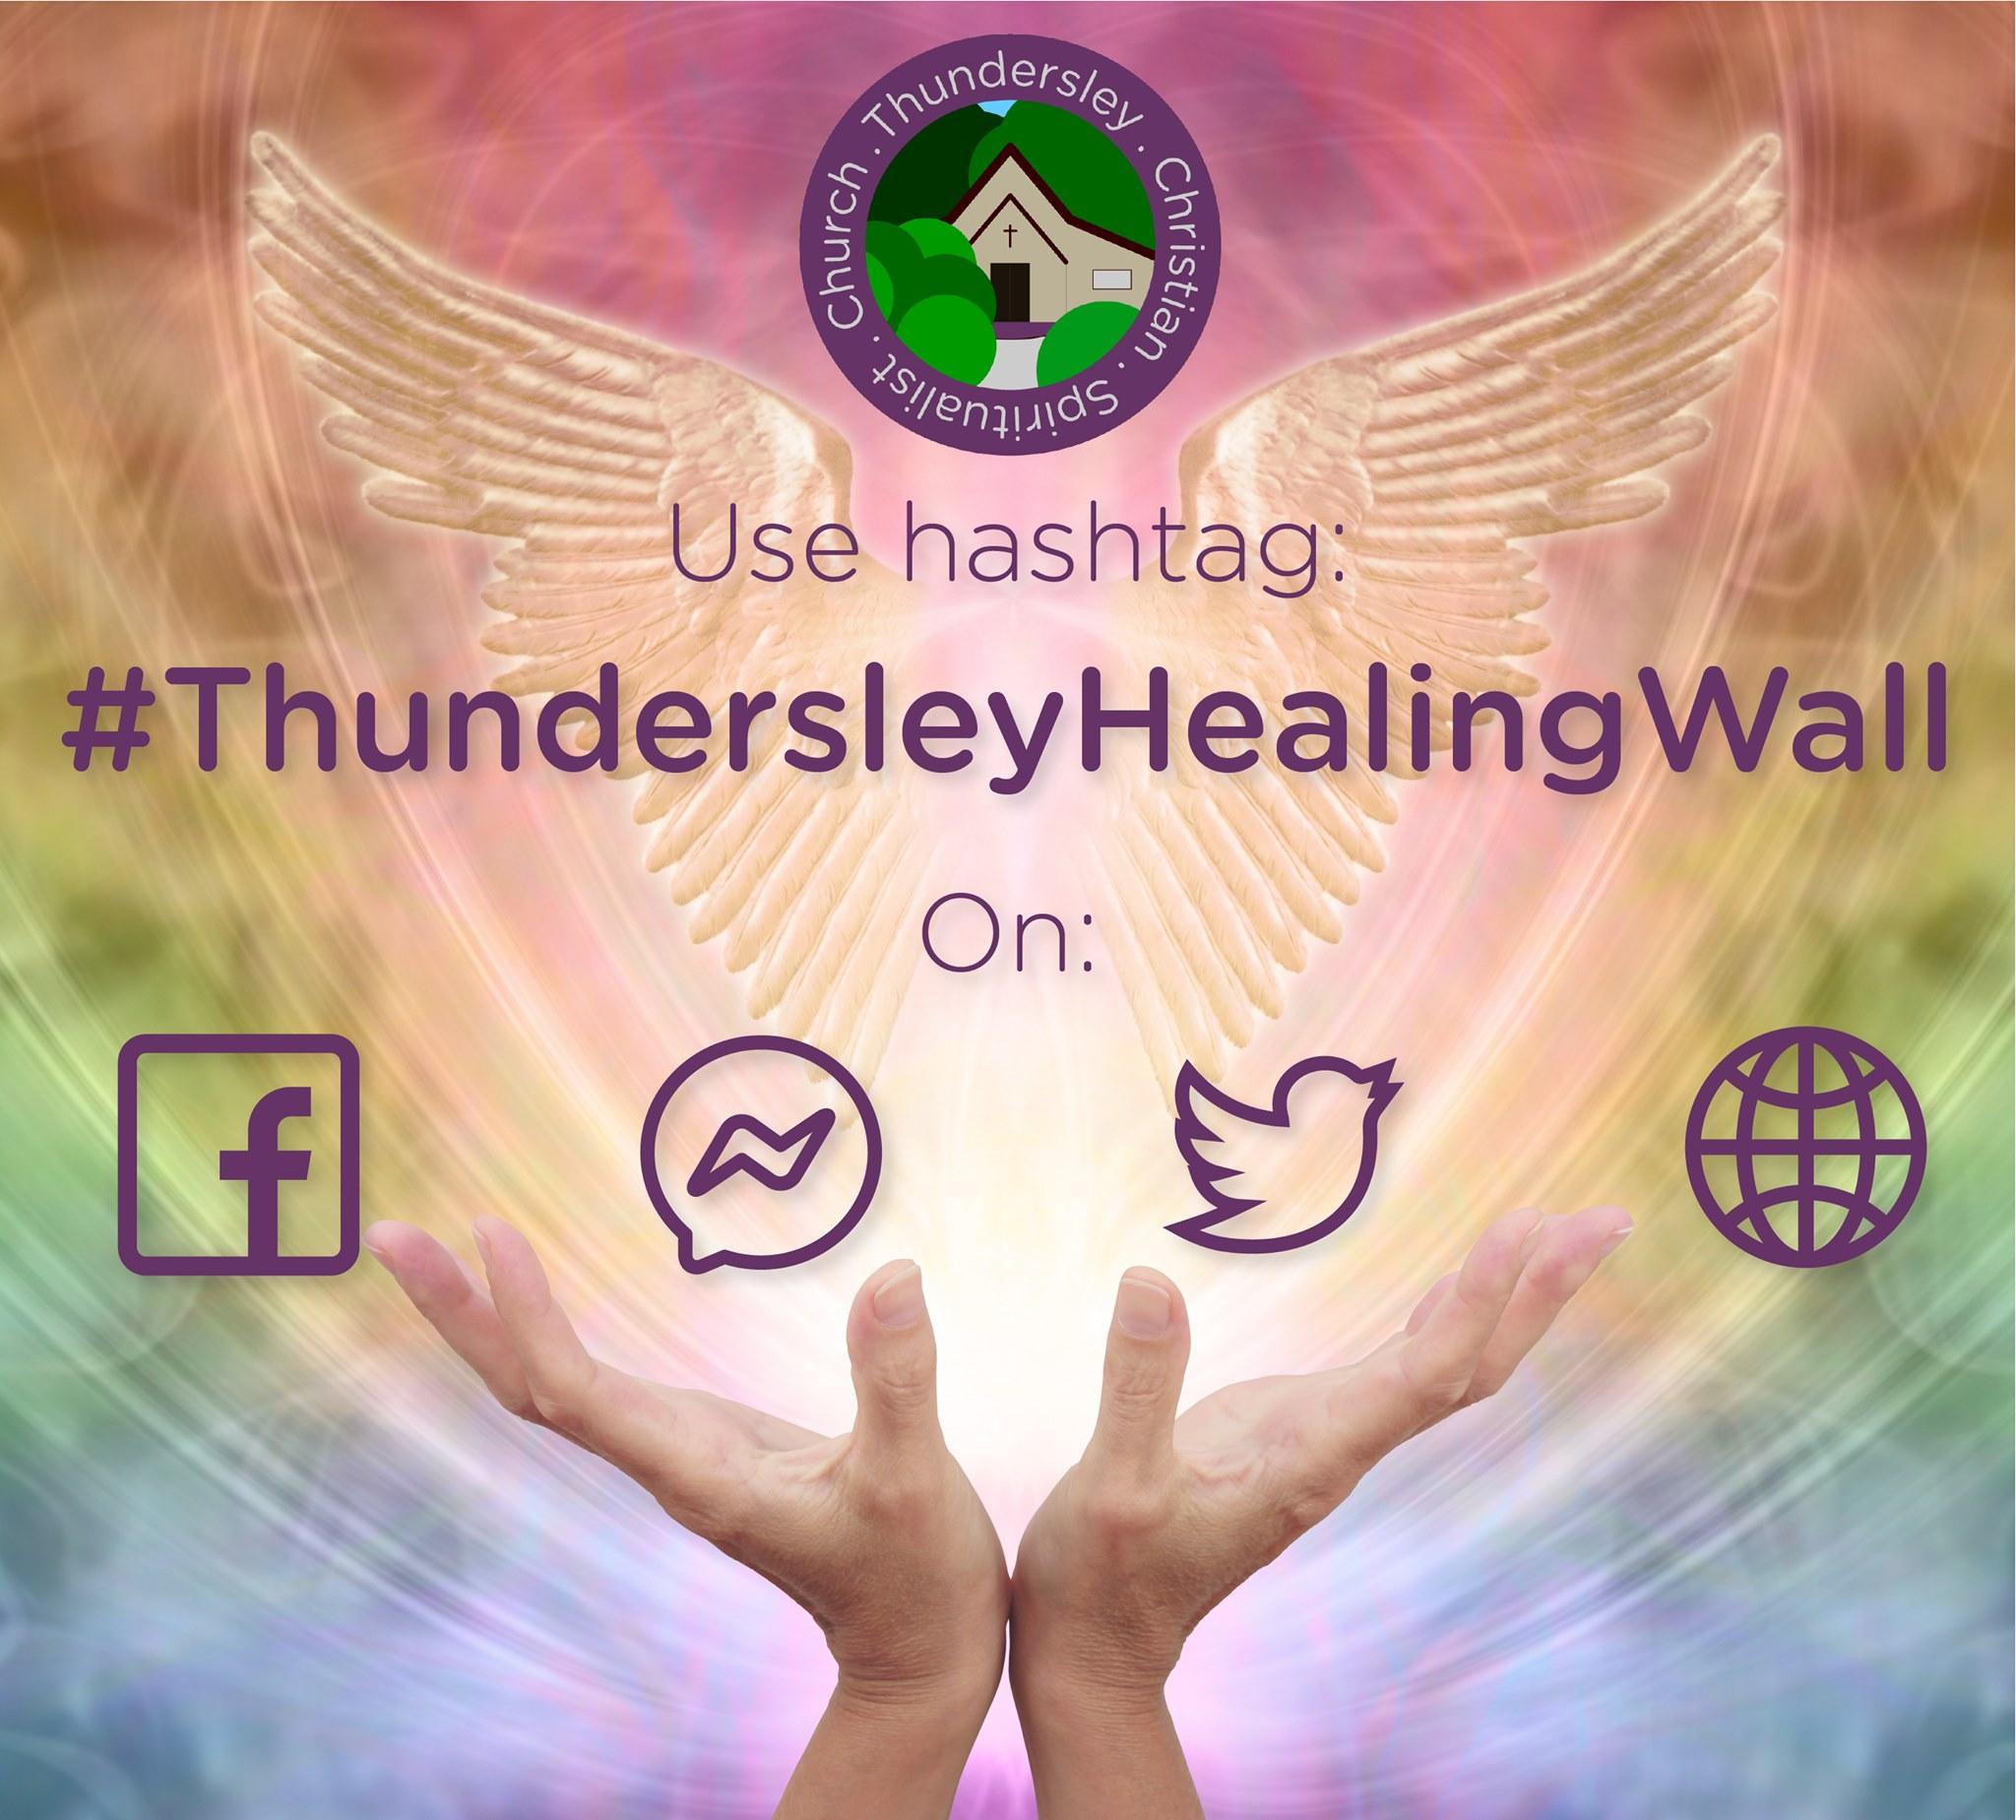 ThundersleyHealingWall